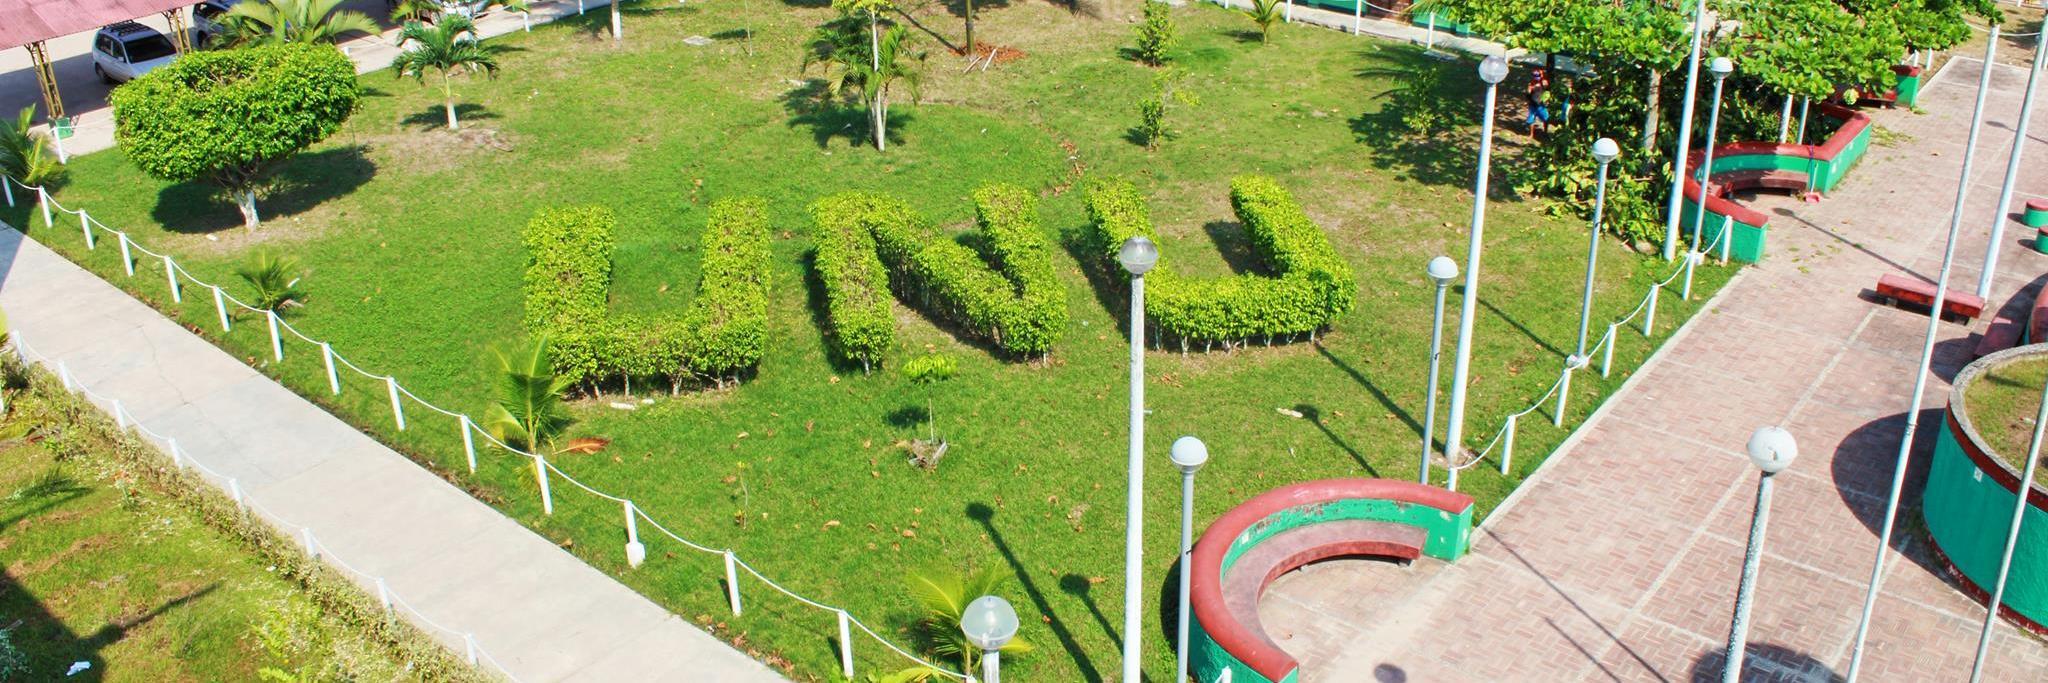 Universidad Nacional de Ucayali's official Twitter account